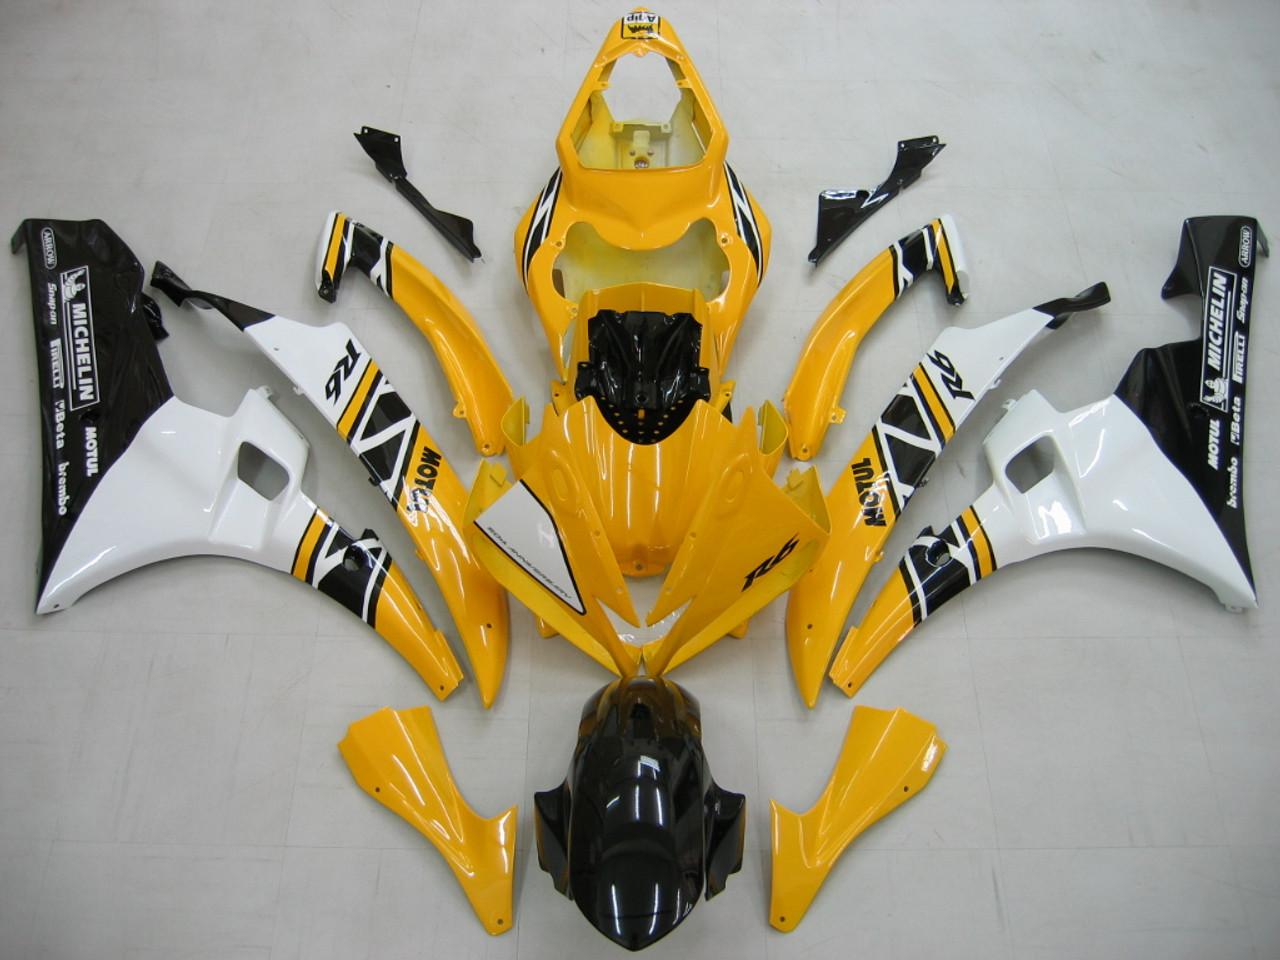 Fairings Yamaha YZF-R6 Yellow White Black Motul R6 Racing (2006-2007)